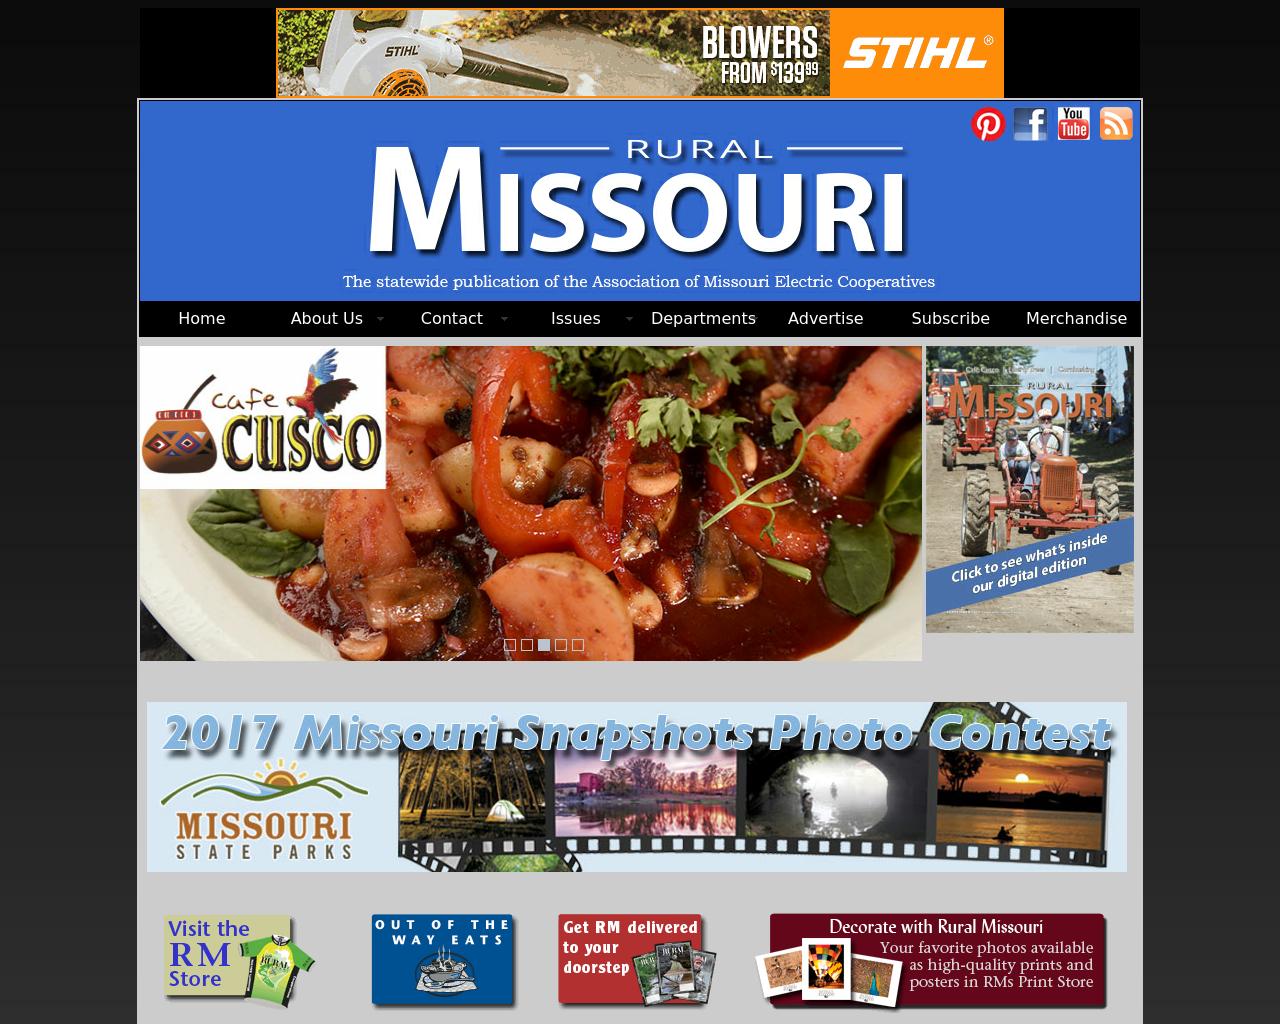 Rural-Missouri-Advertising-Reviews-Pricing